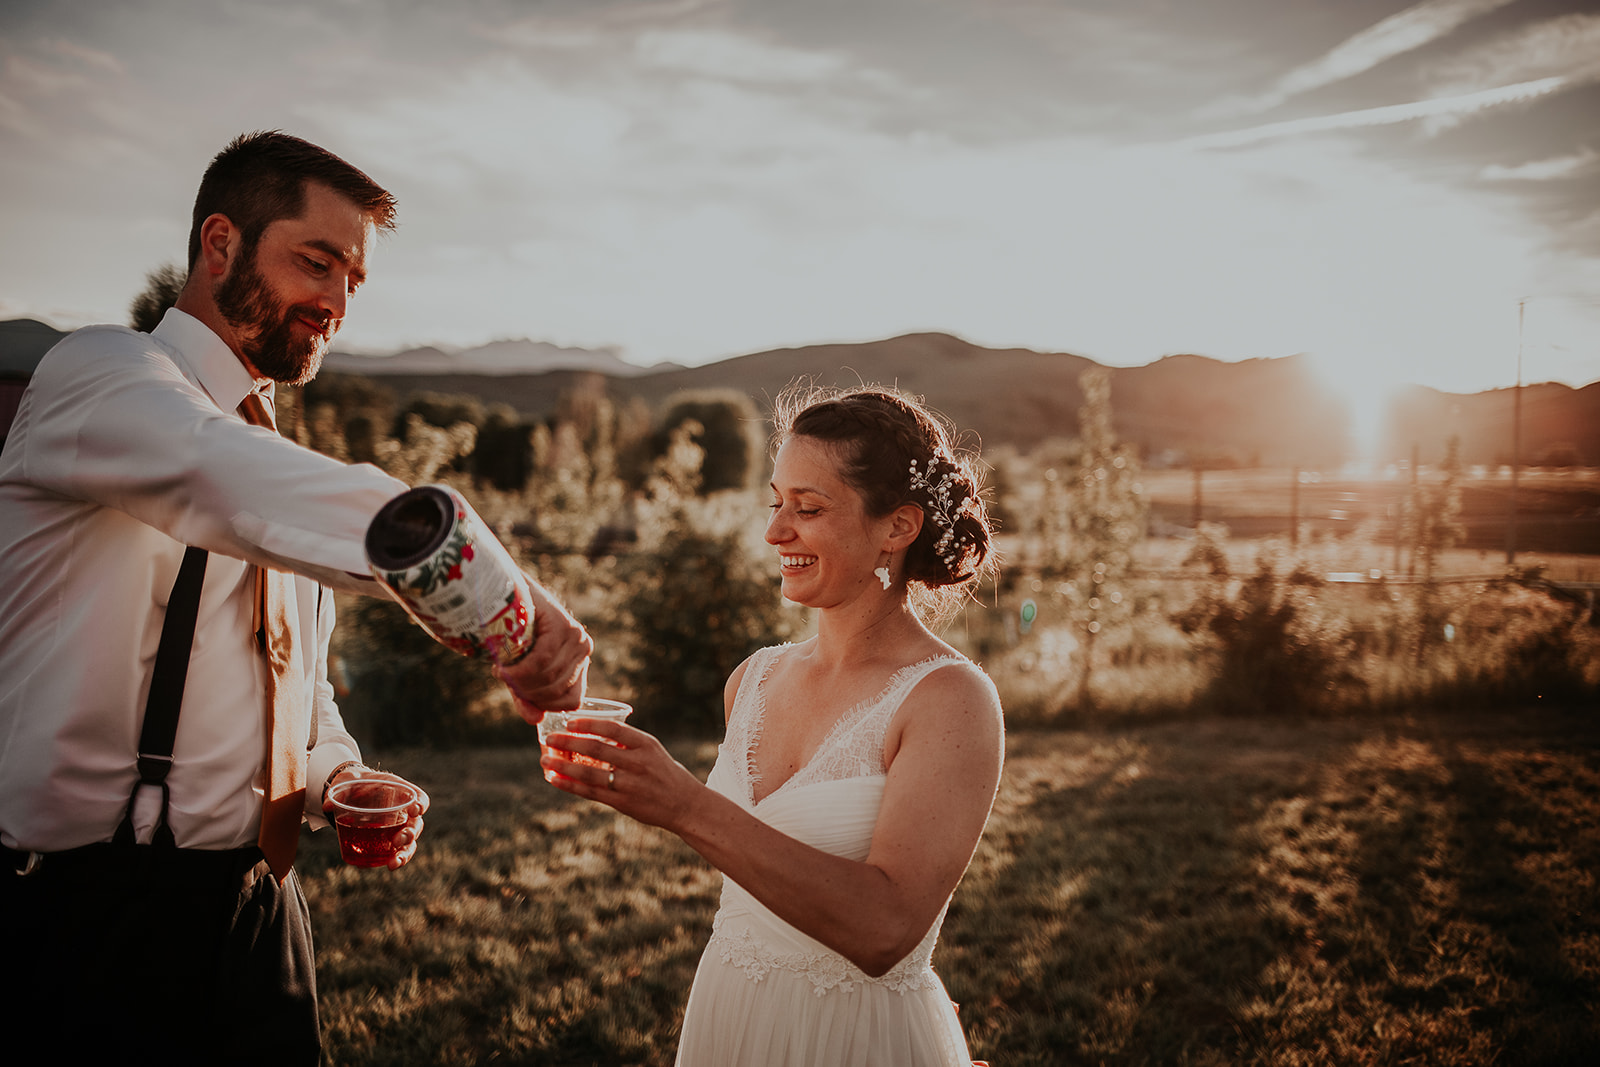 north-cascades-elopement-wedding-winthrop-wedding-photographer-megan-gallagher-photography (40).jpg